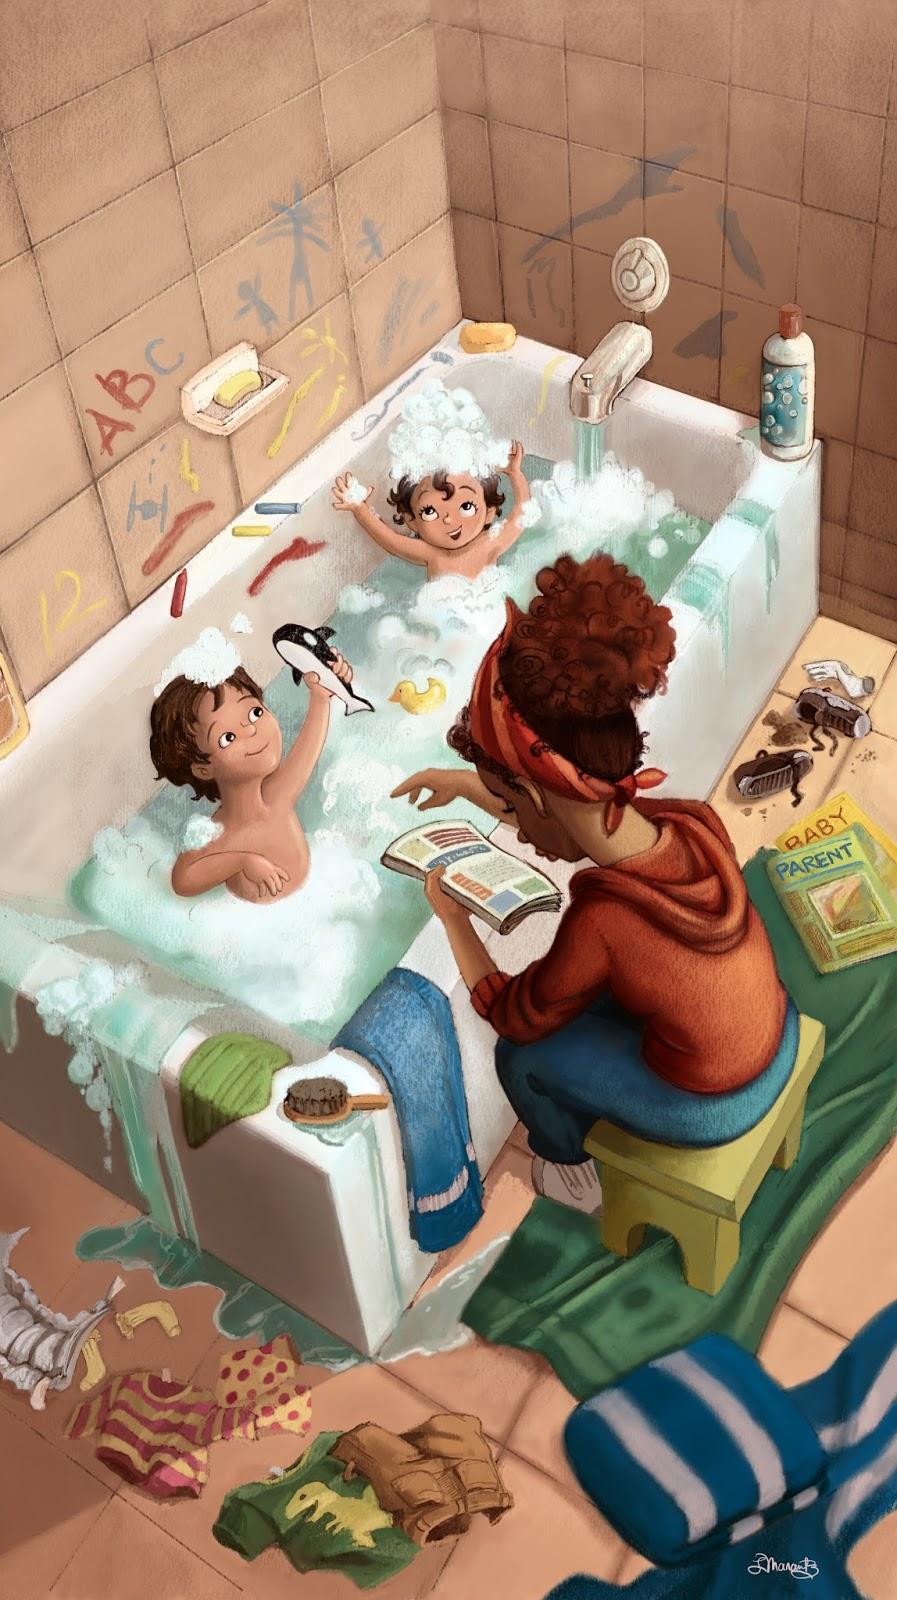 Cute Paint For Bathtub Tiny Bathtub Refinishers Round Tub Refinishers Painting Tub Old Paint A Tub Bright Bathtub Reglazers